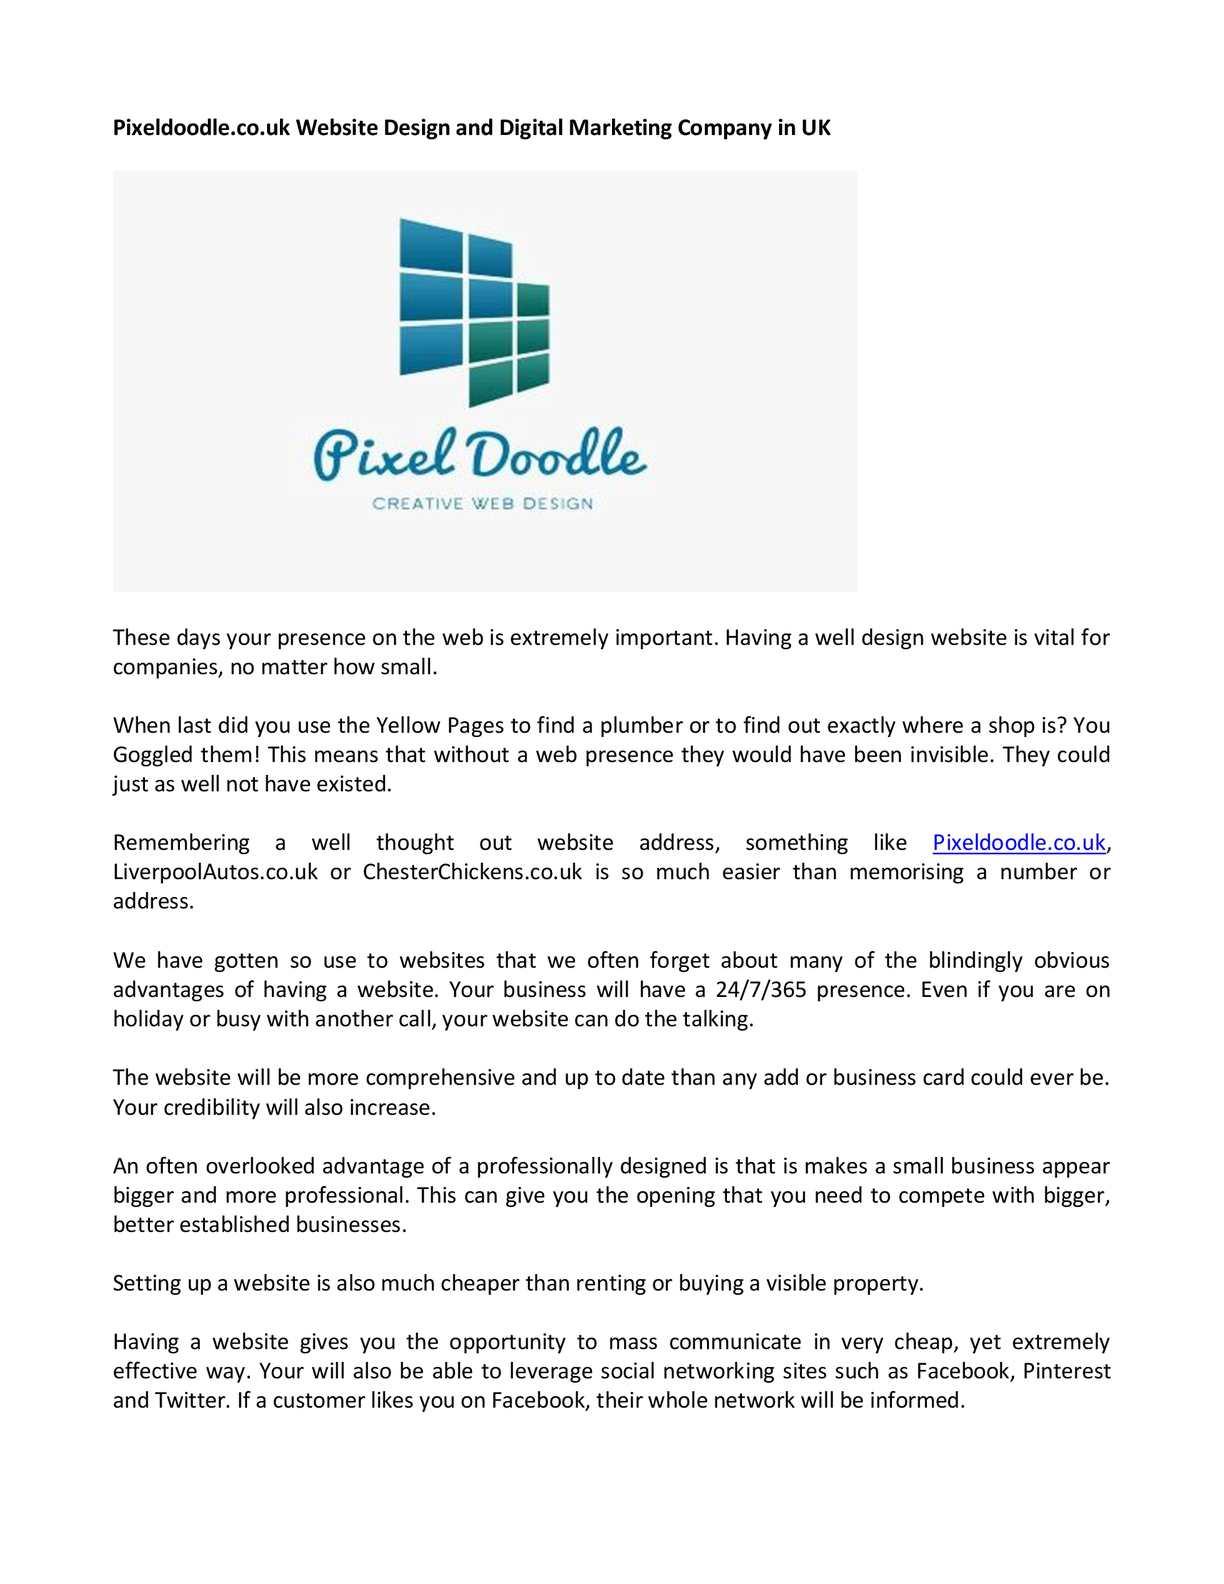 Calaméo Pixeldoodle Website Design and Digital Marketing